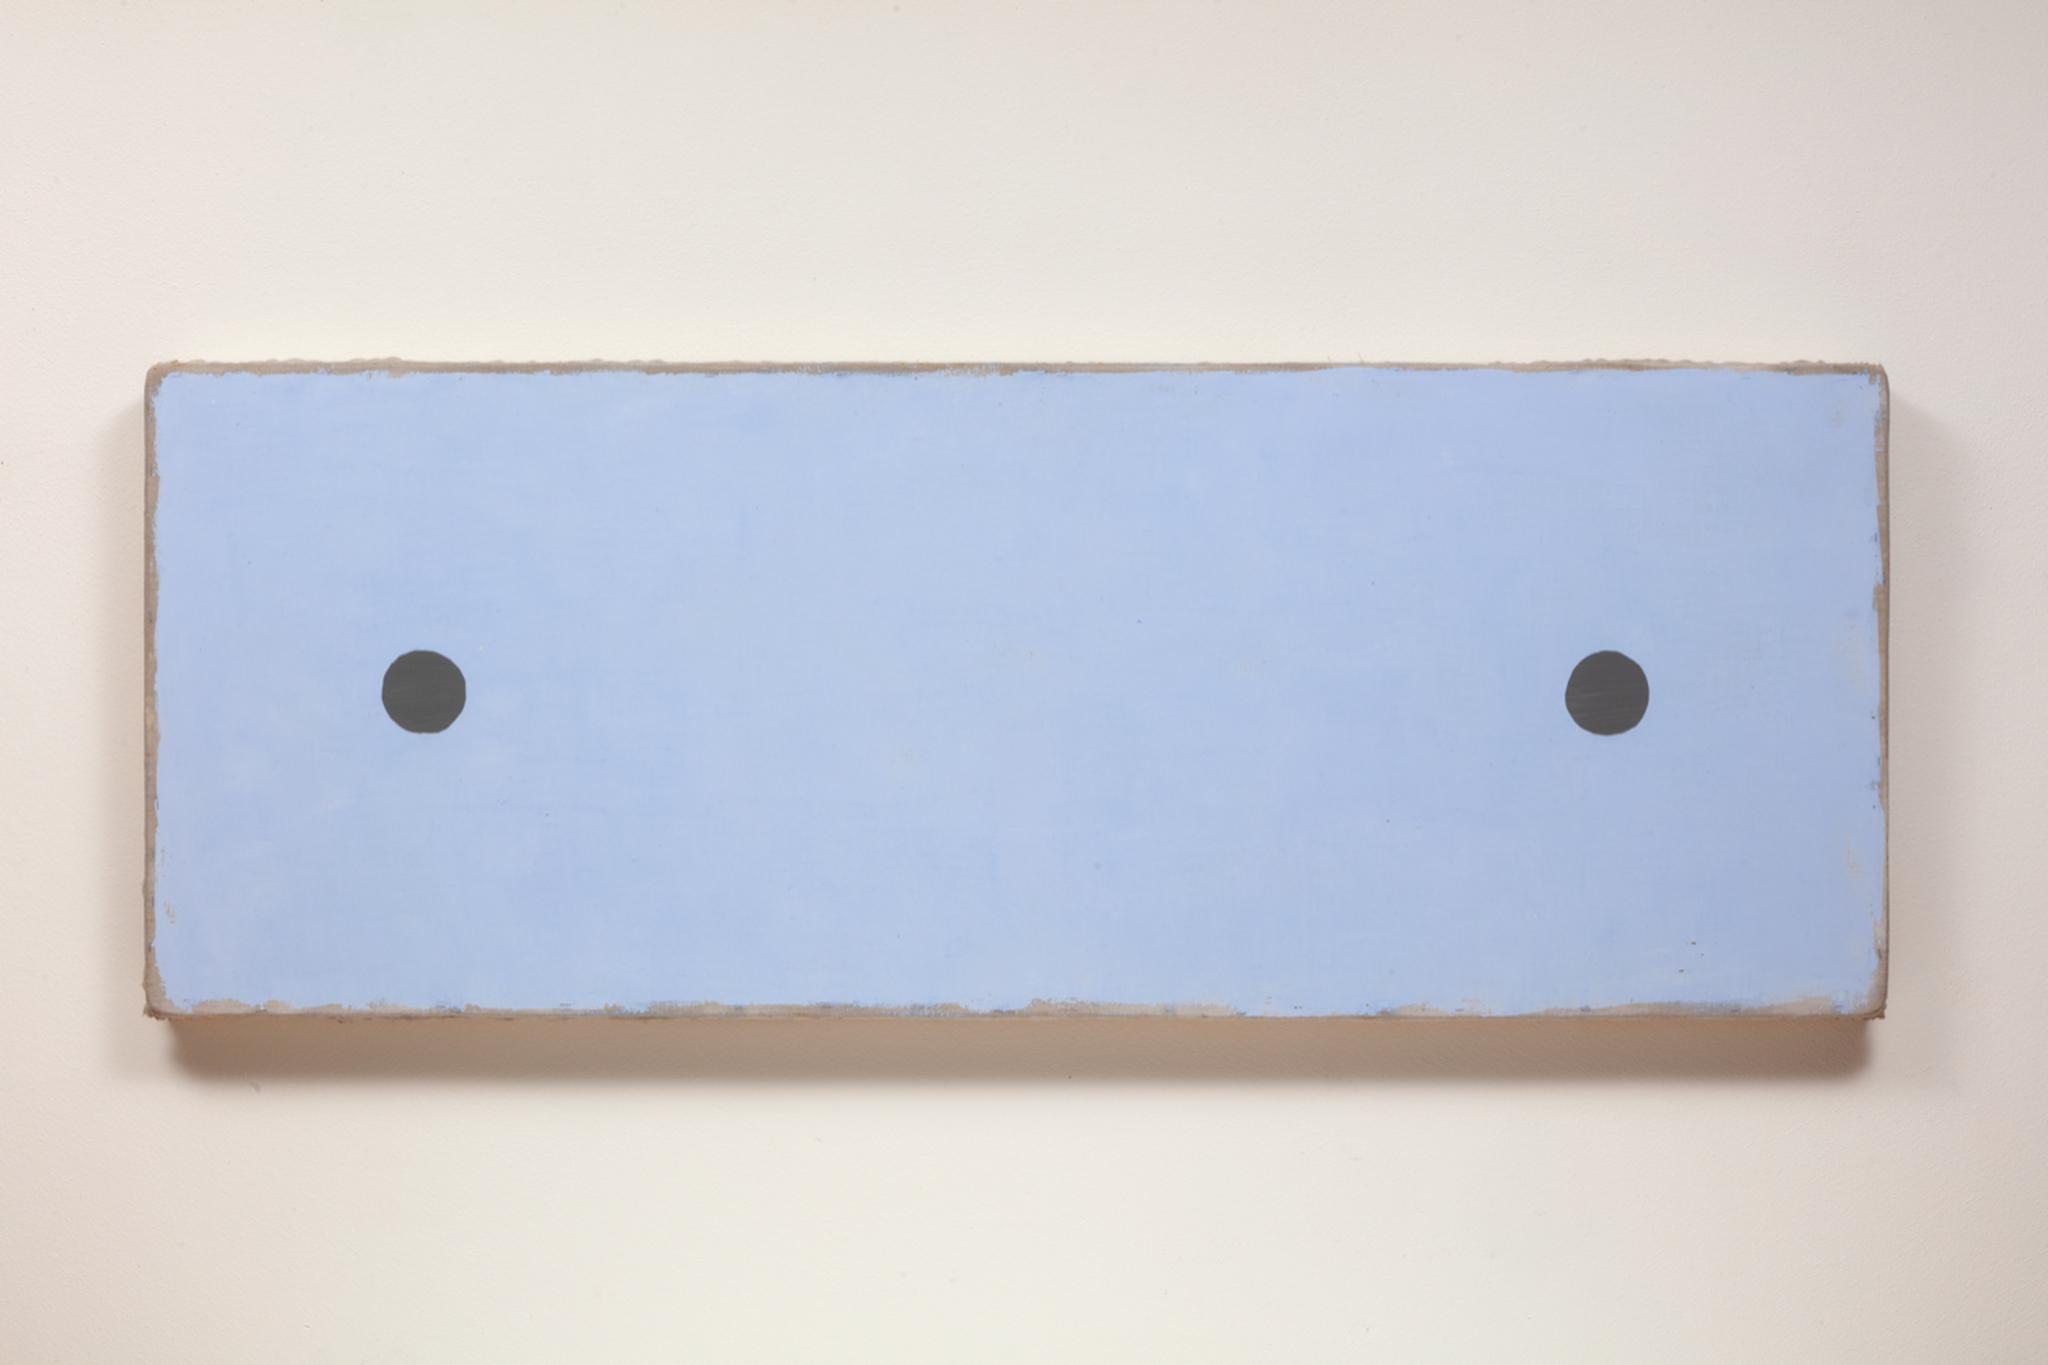 "2. Otis Jones - 2 Grey Circles Far Apart, 2019 - Acrylic on linen on wood, - 30"" x 80"" x 3 3⁄4"" - 76.2 CM. x 203.2 CM. x 9.5 CM"